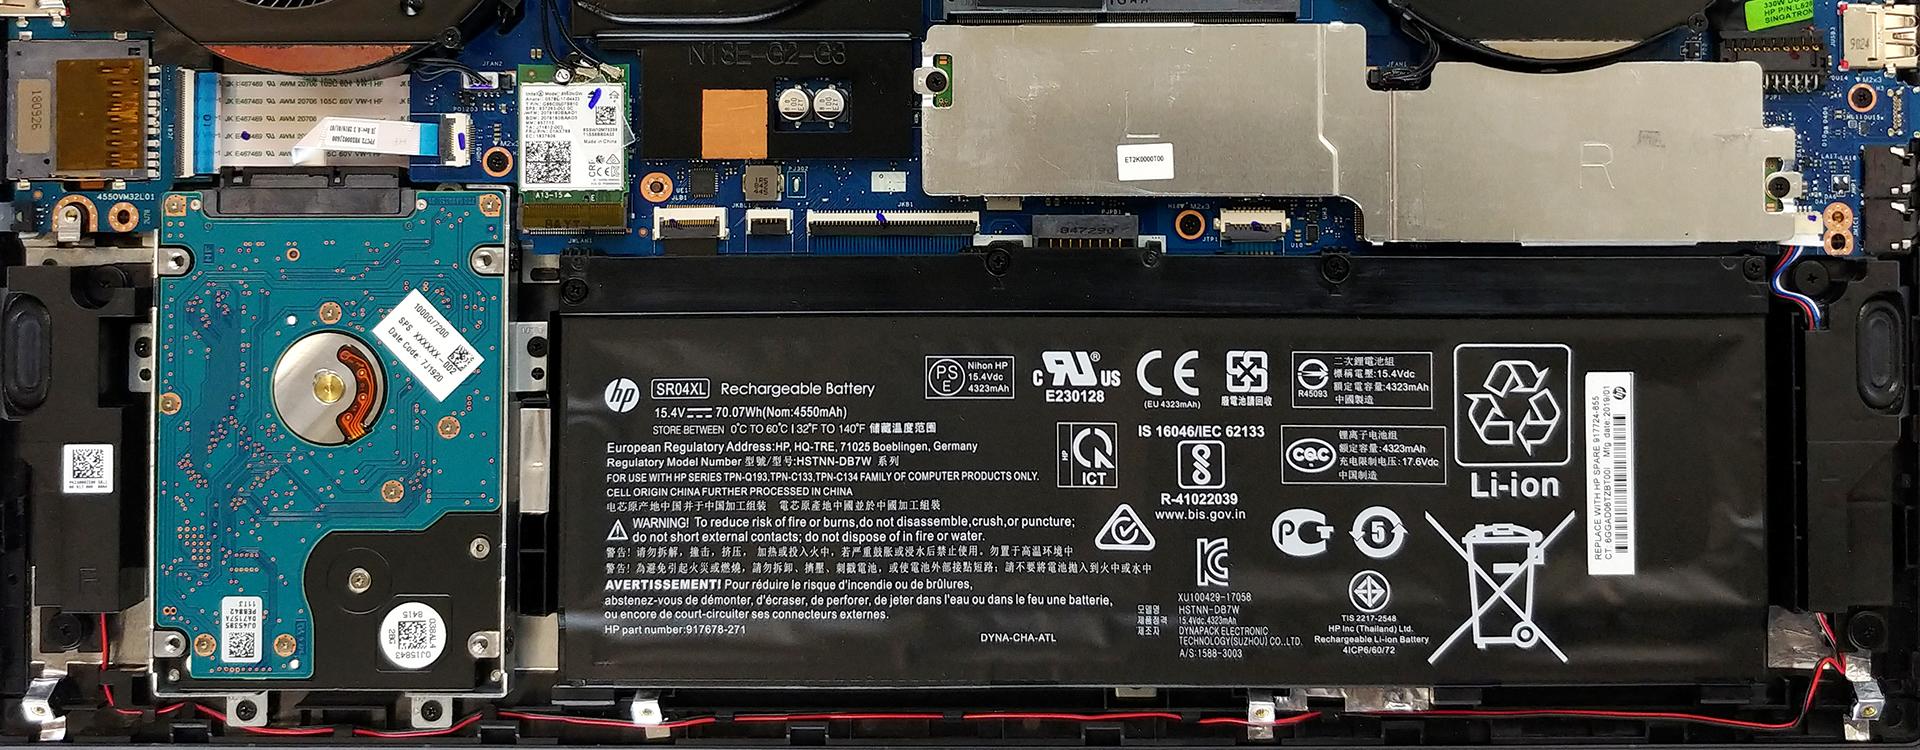 HP Omen 17 (2019) review – proper look at the 9th Gen Intel